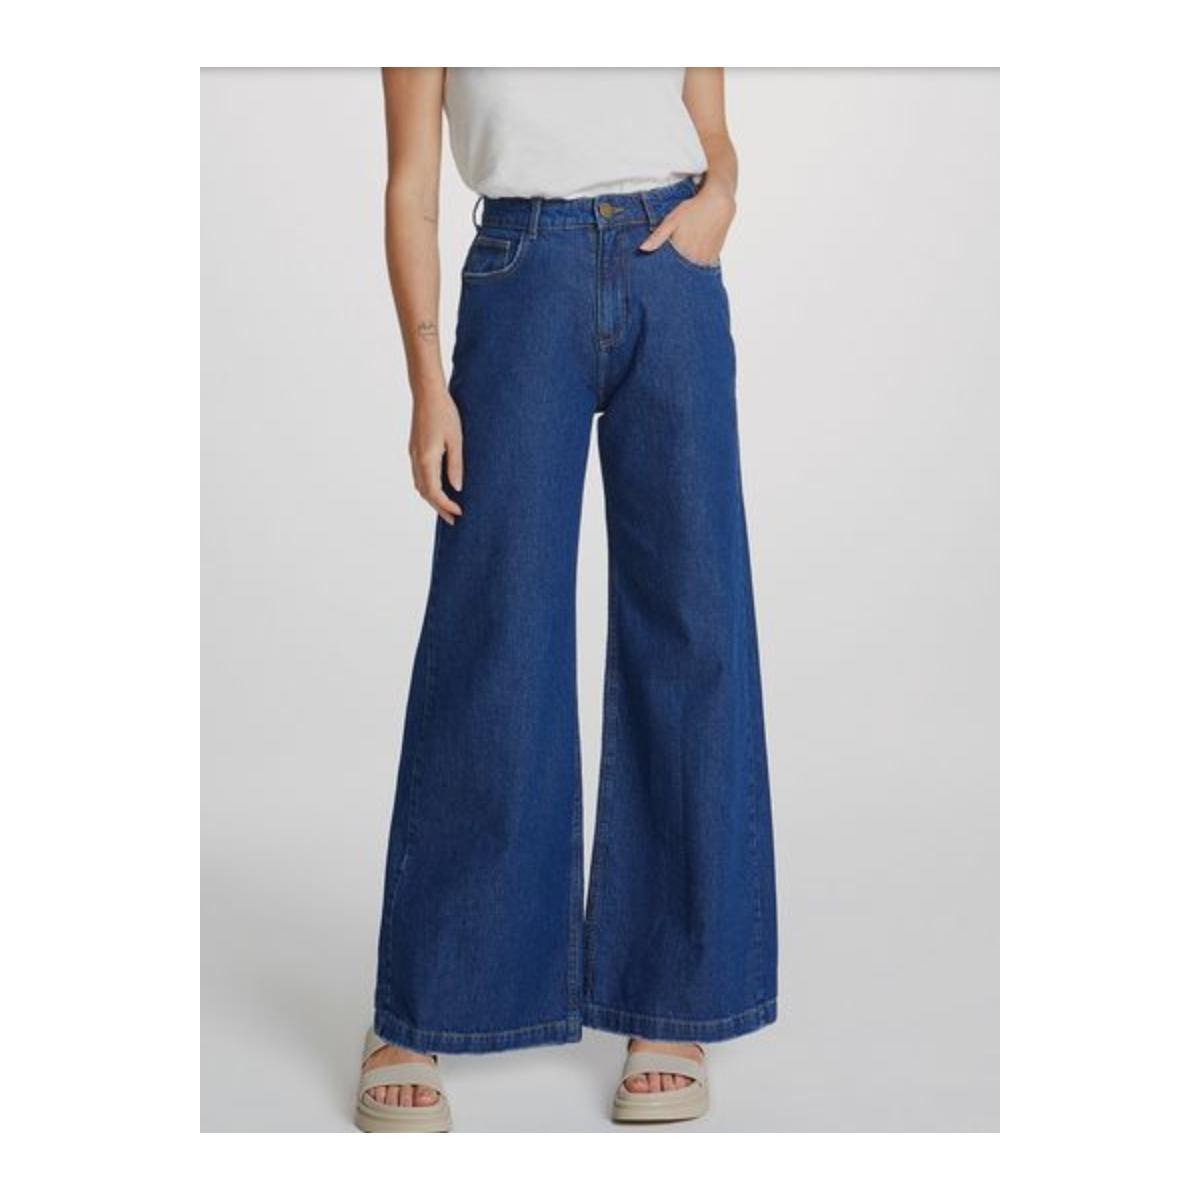 Calça Feminina Hering H9ag 1bsn  Jeans Escuro